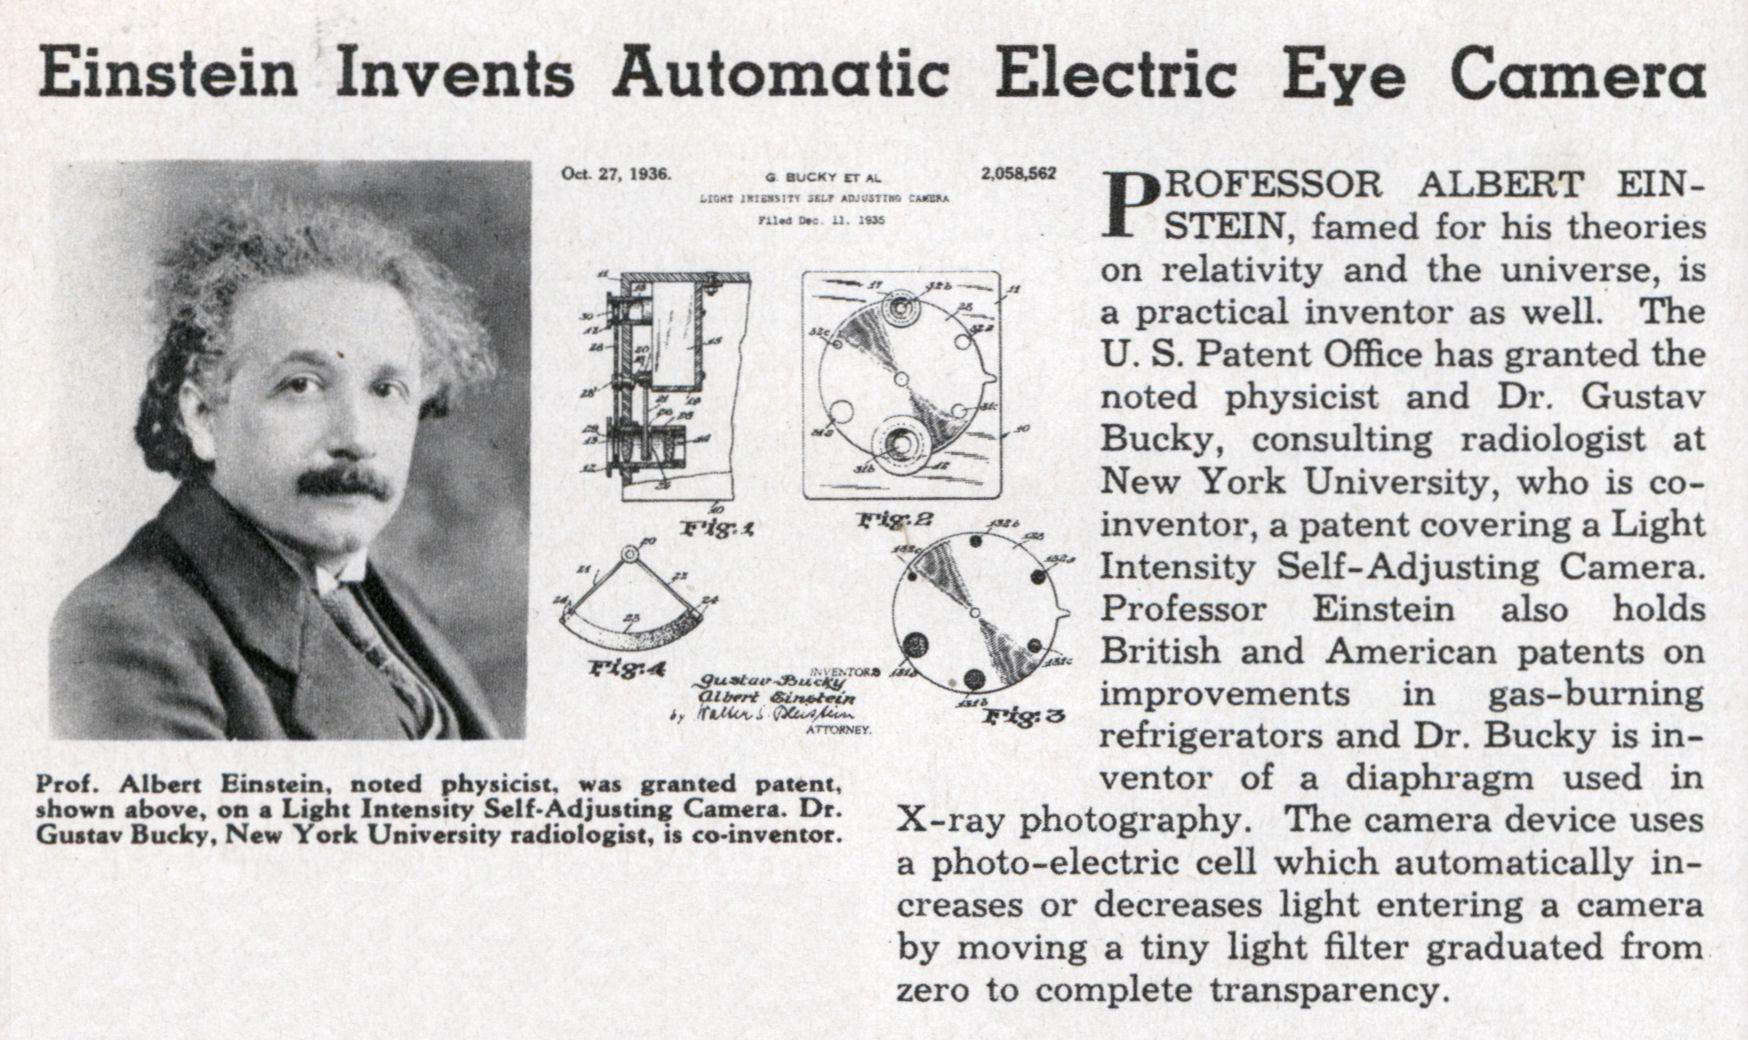 004 Enstein Camera Essay Example Albert Awesome Einstein Essays In Humanism Pdf Science Kannada Full